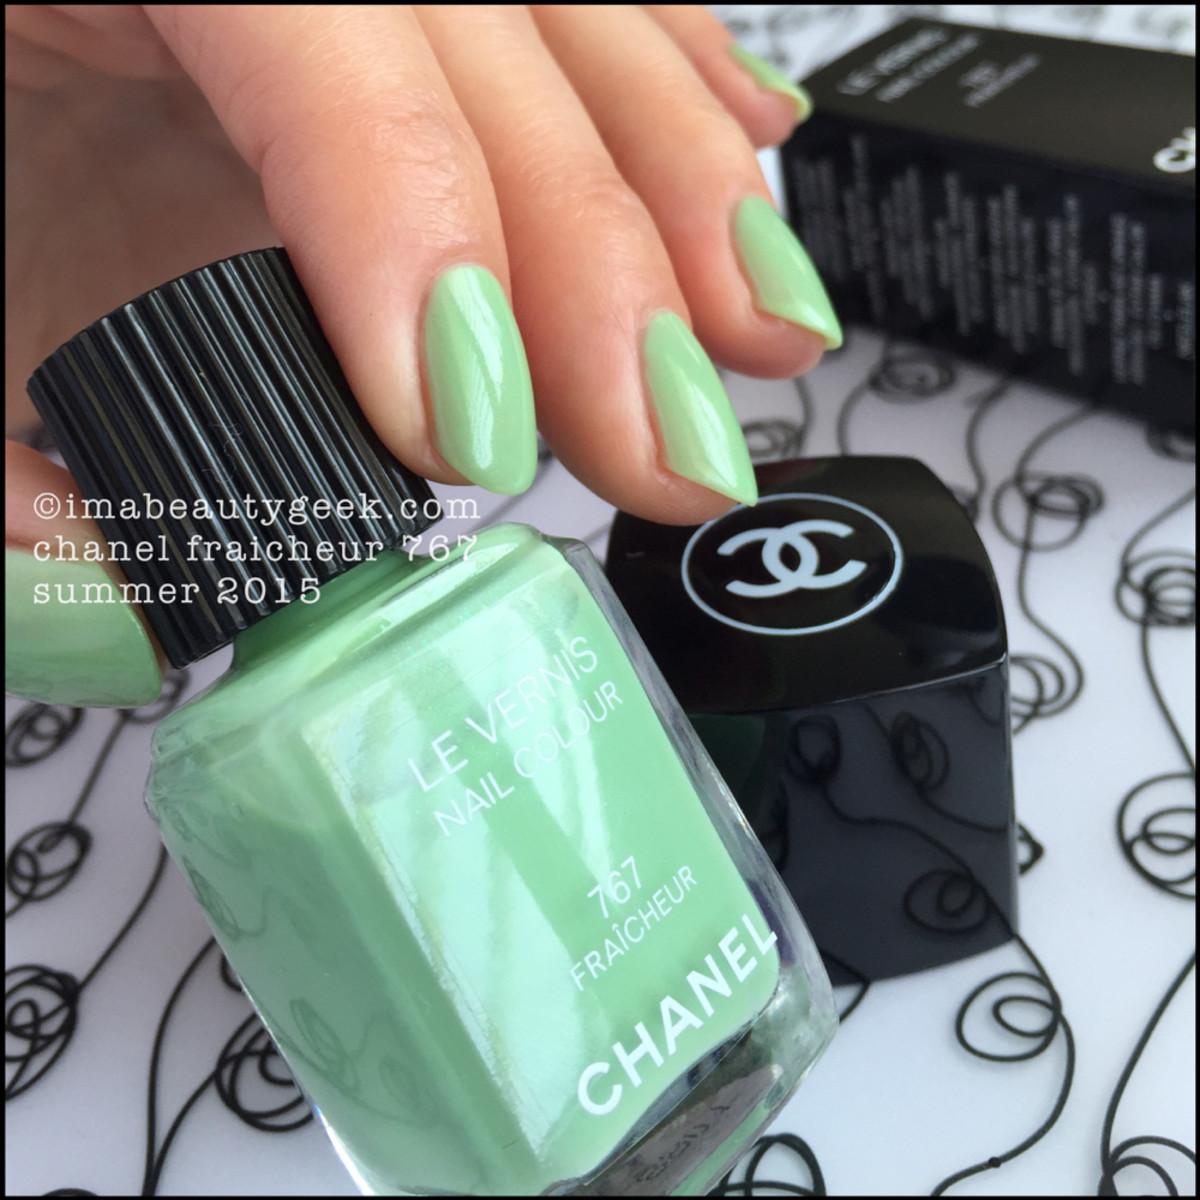 Chanel Fraicheur Le Vernis Nail Polish Swatch Beautygeeks